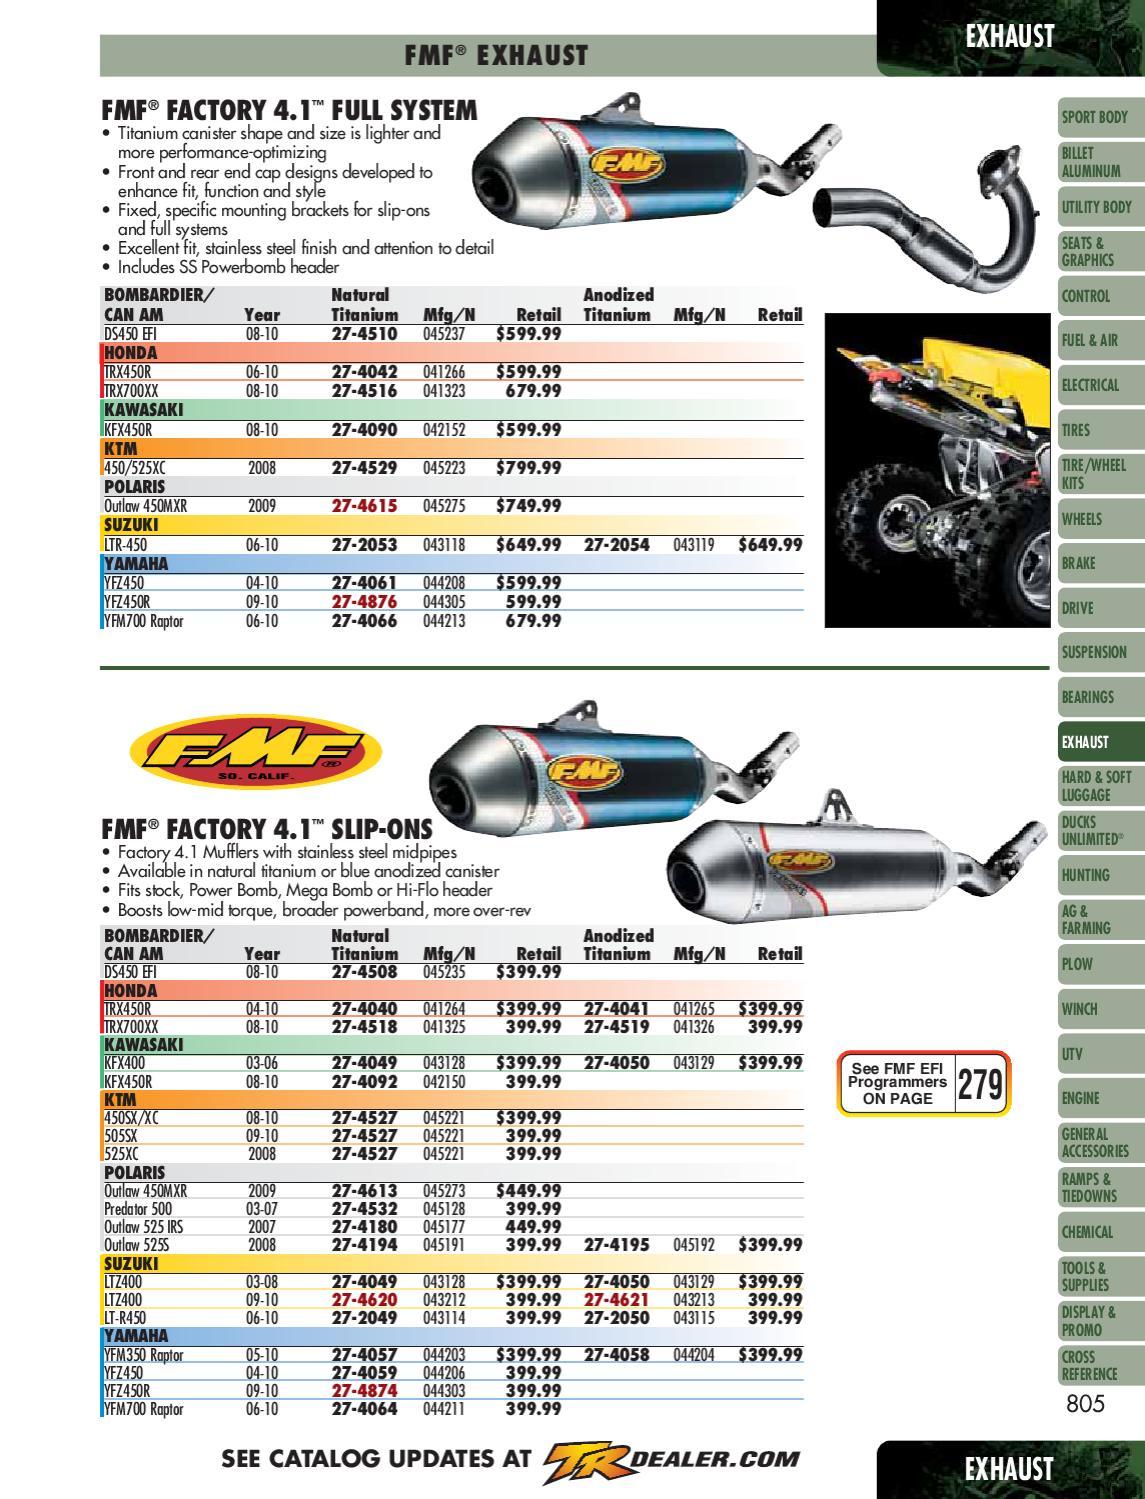 DG RCM II Slip-on Exhaust w// Quiet Core For Honda TRX350 Rancher 00-06